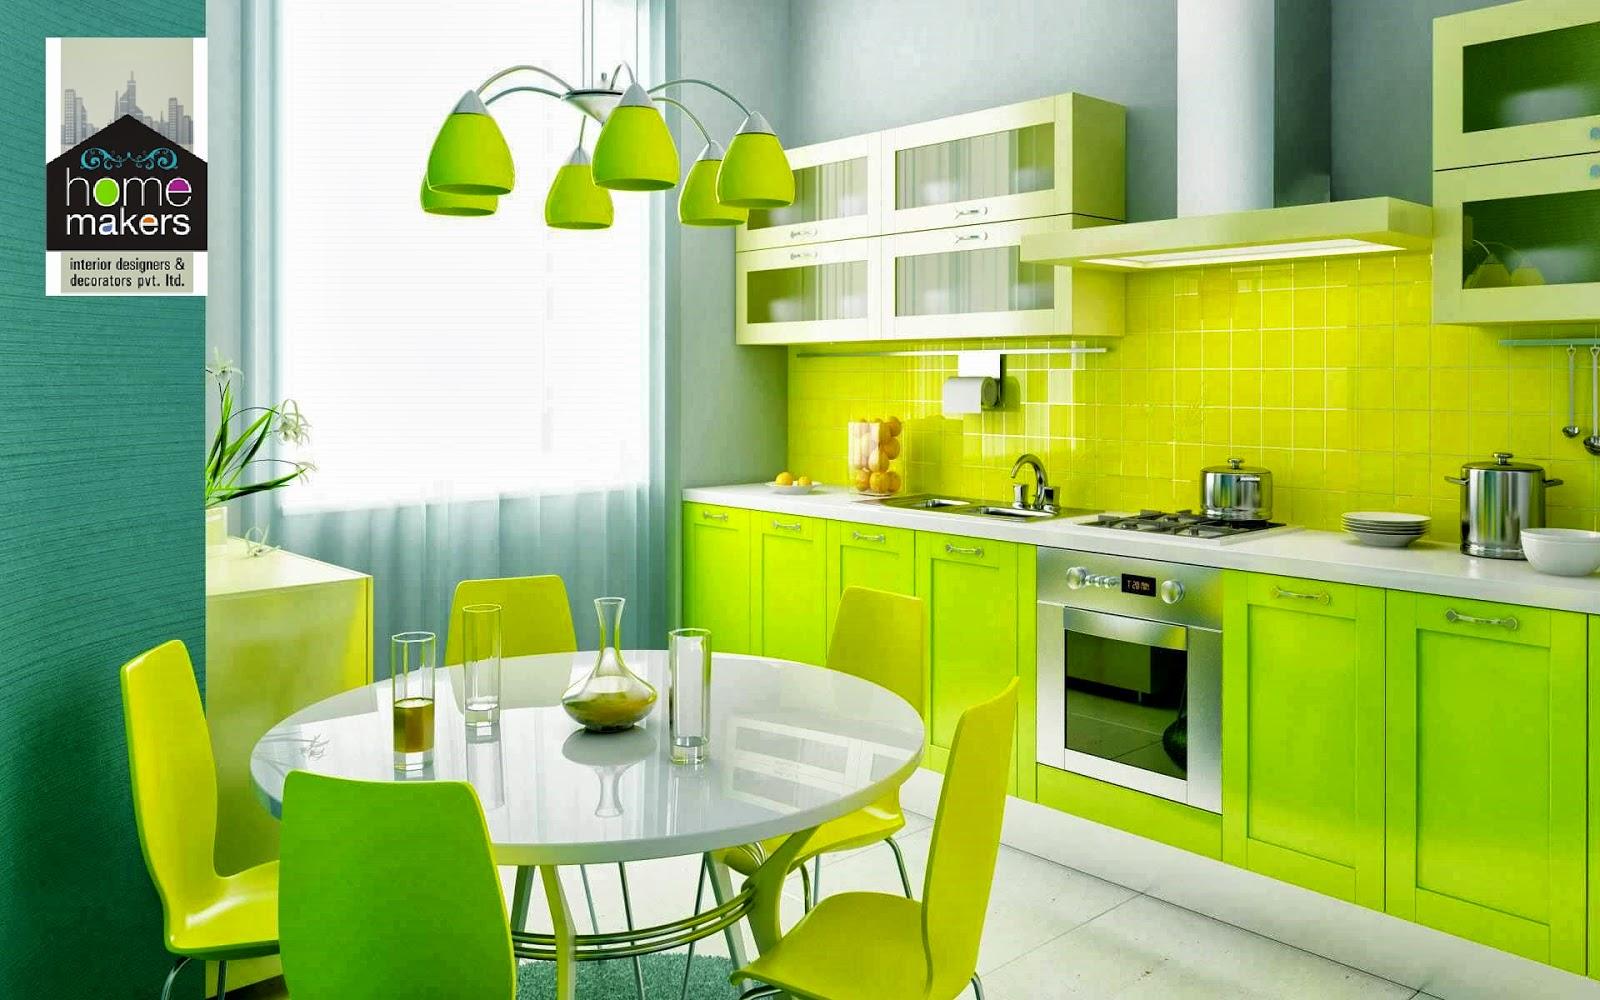 home makers interior designers and decorators pvt ltd